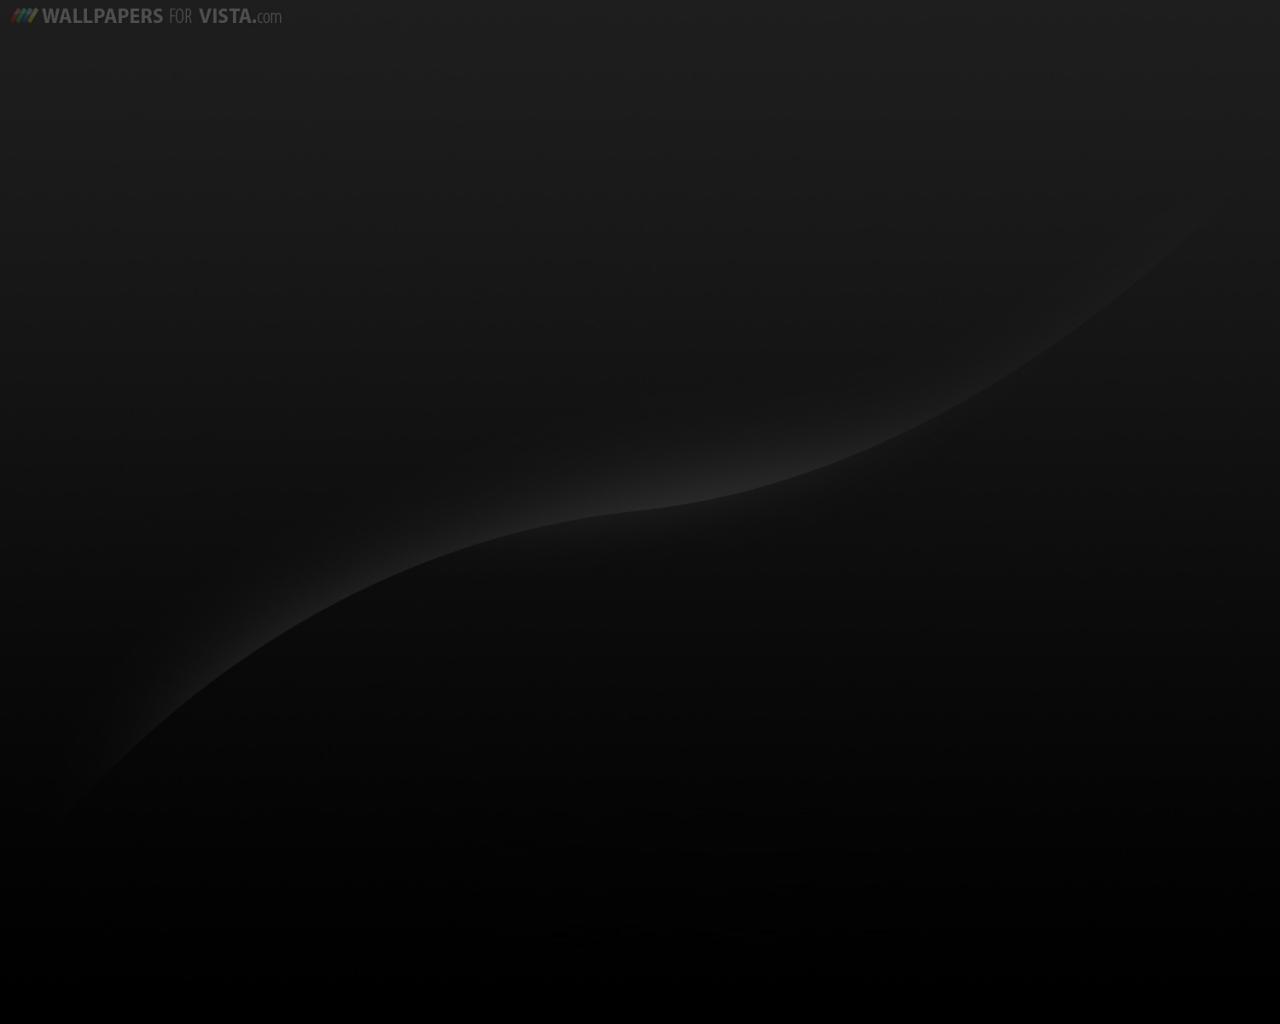 wallpaper black background 1280x1024